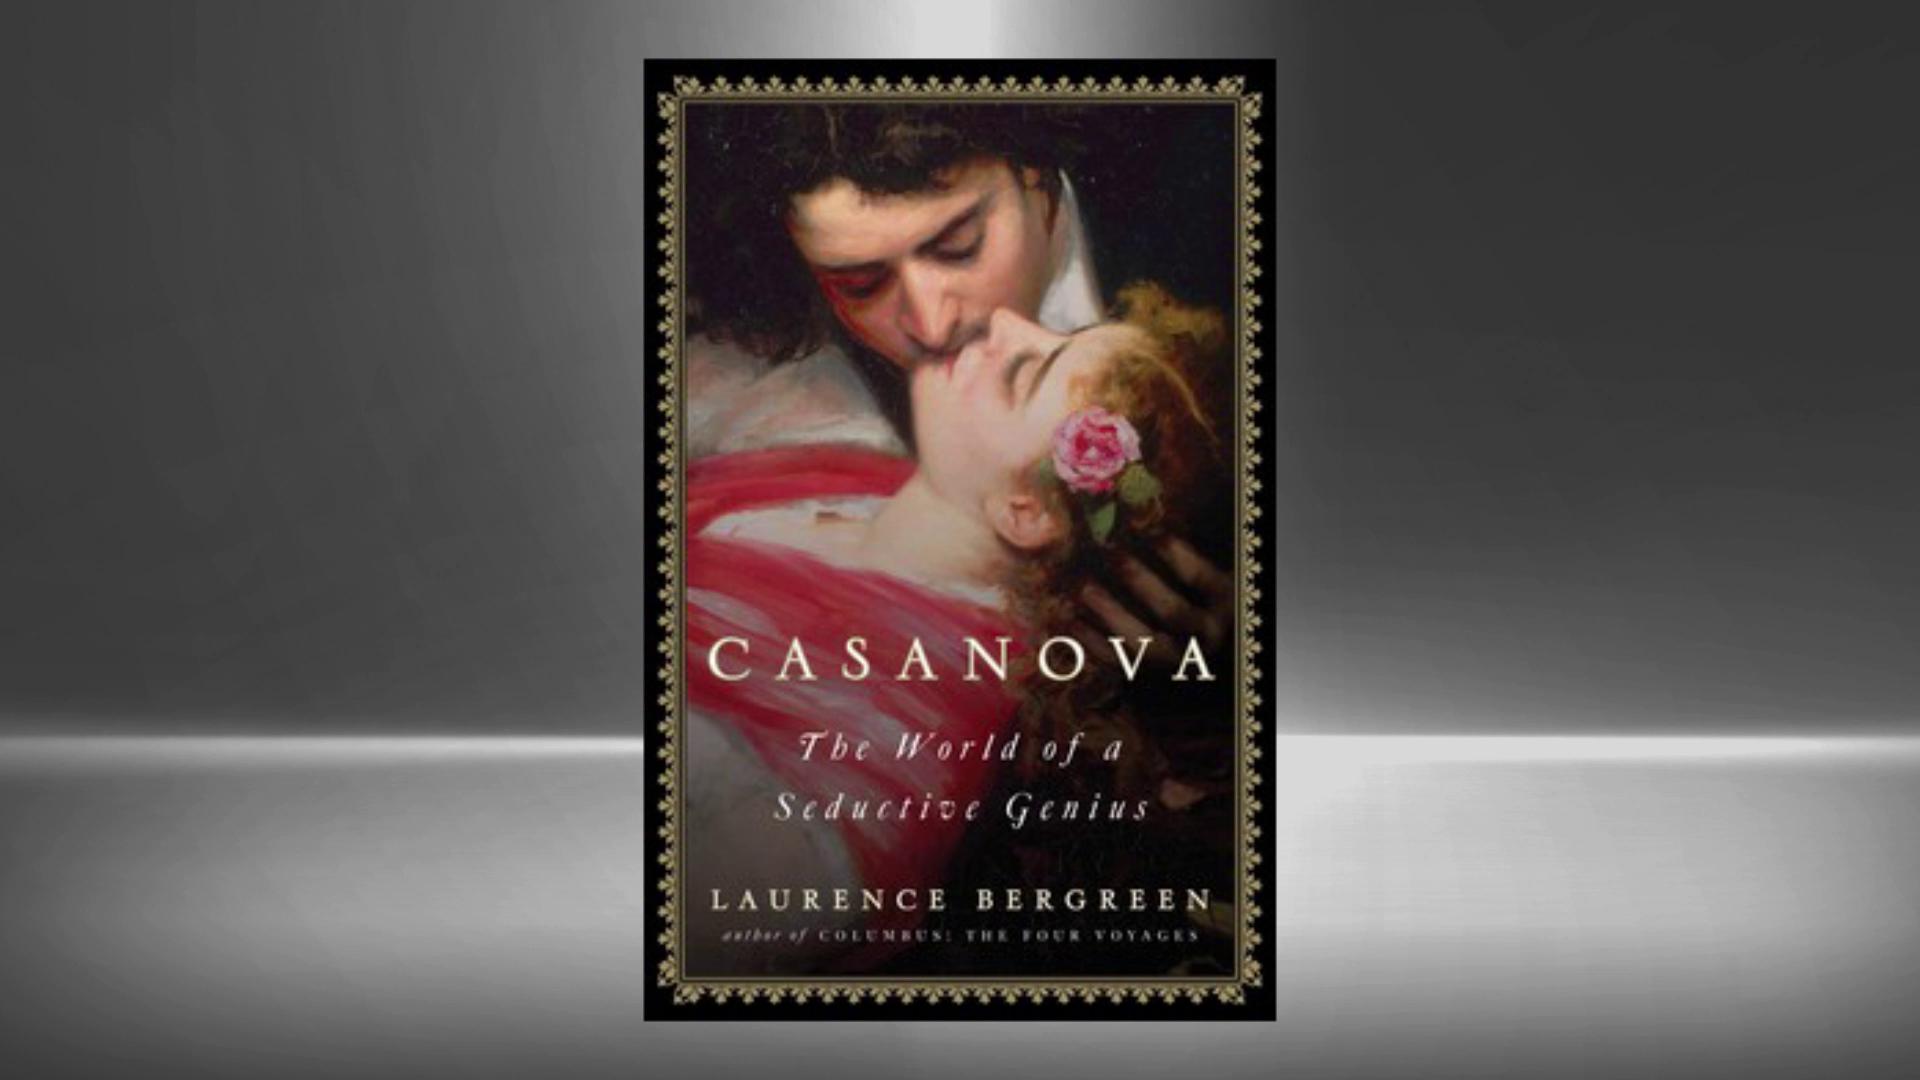 The life of CASANOVA